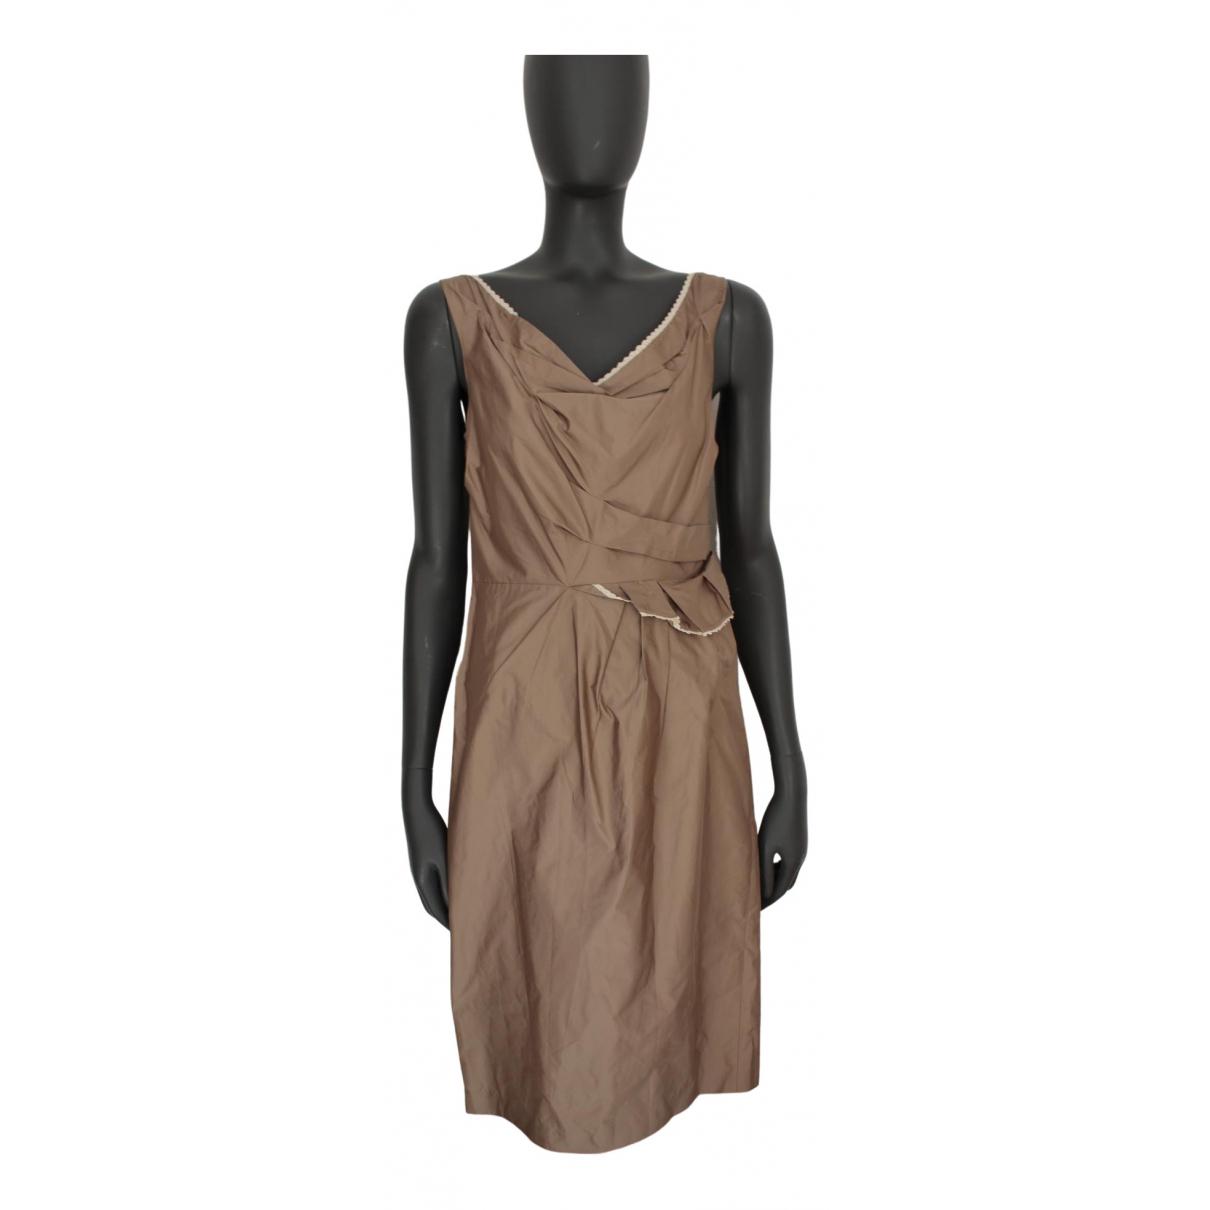 Hoss Intropia \N Kleid in  Braun Polyester